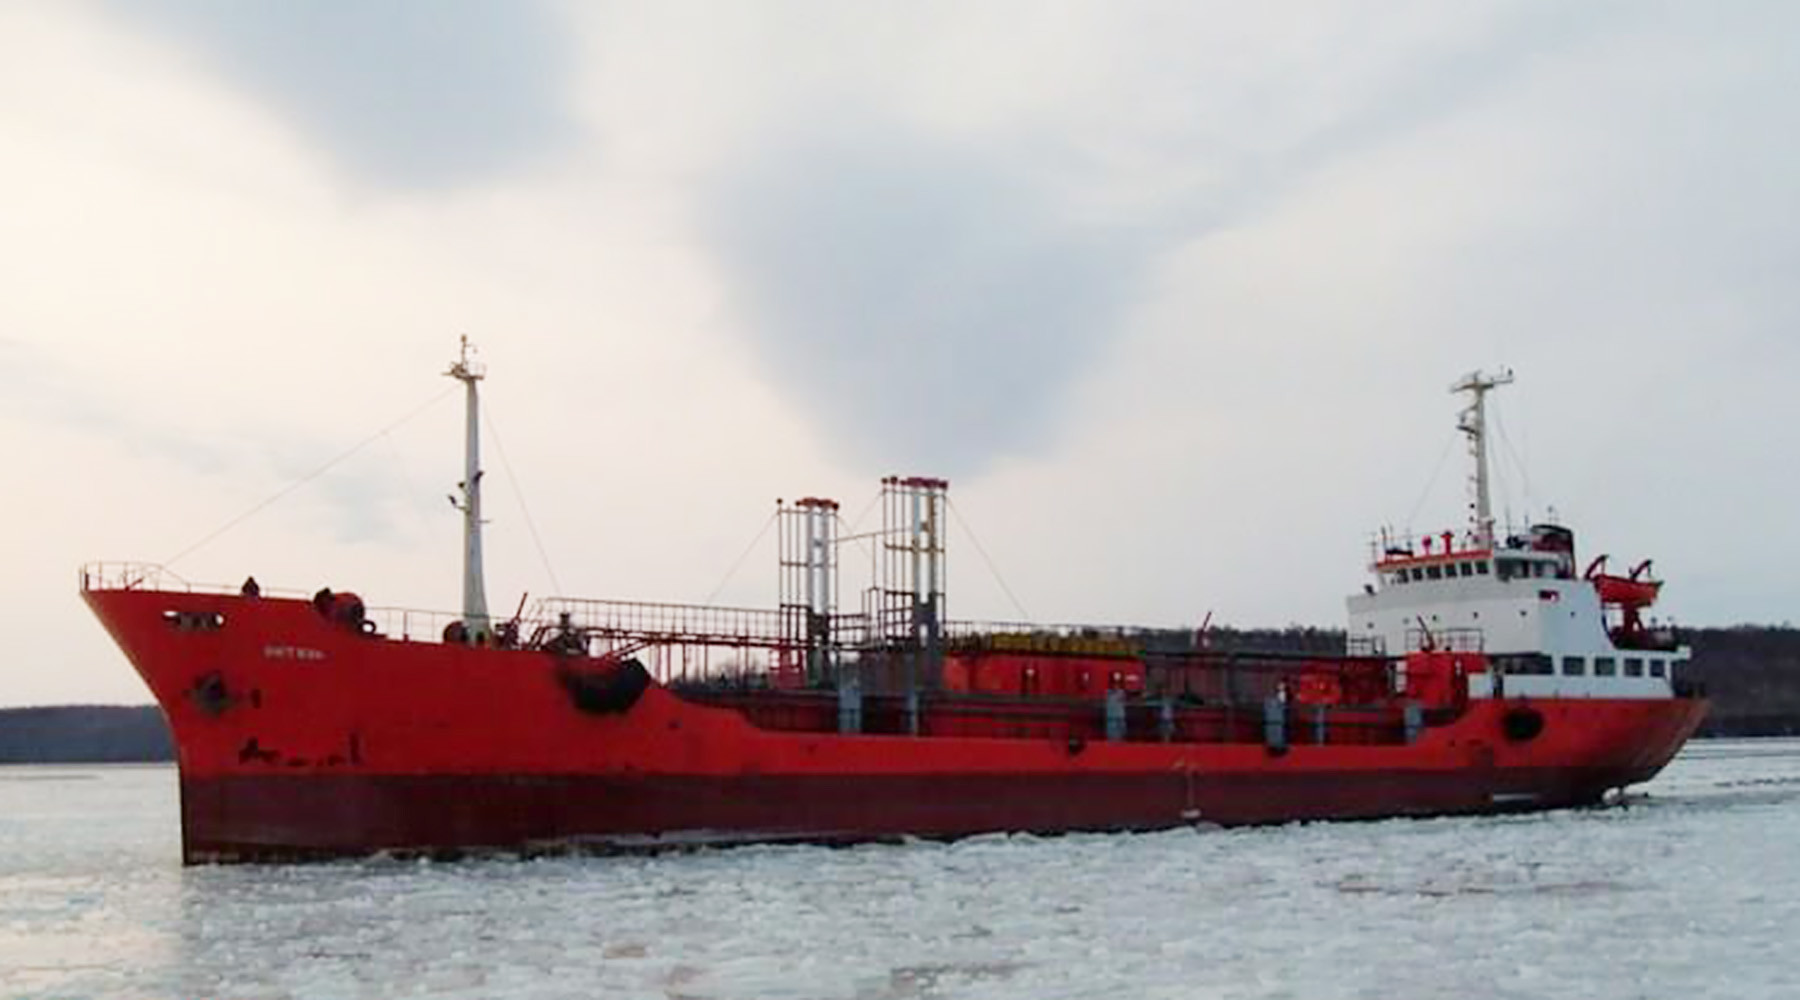 Москва опоставках нефти КНДР: Полного запрета нет